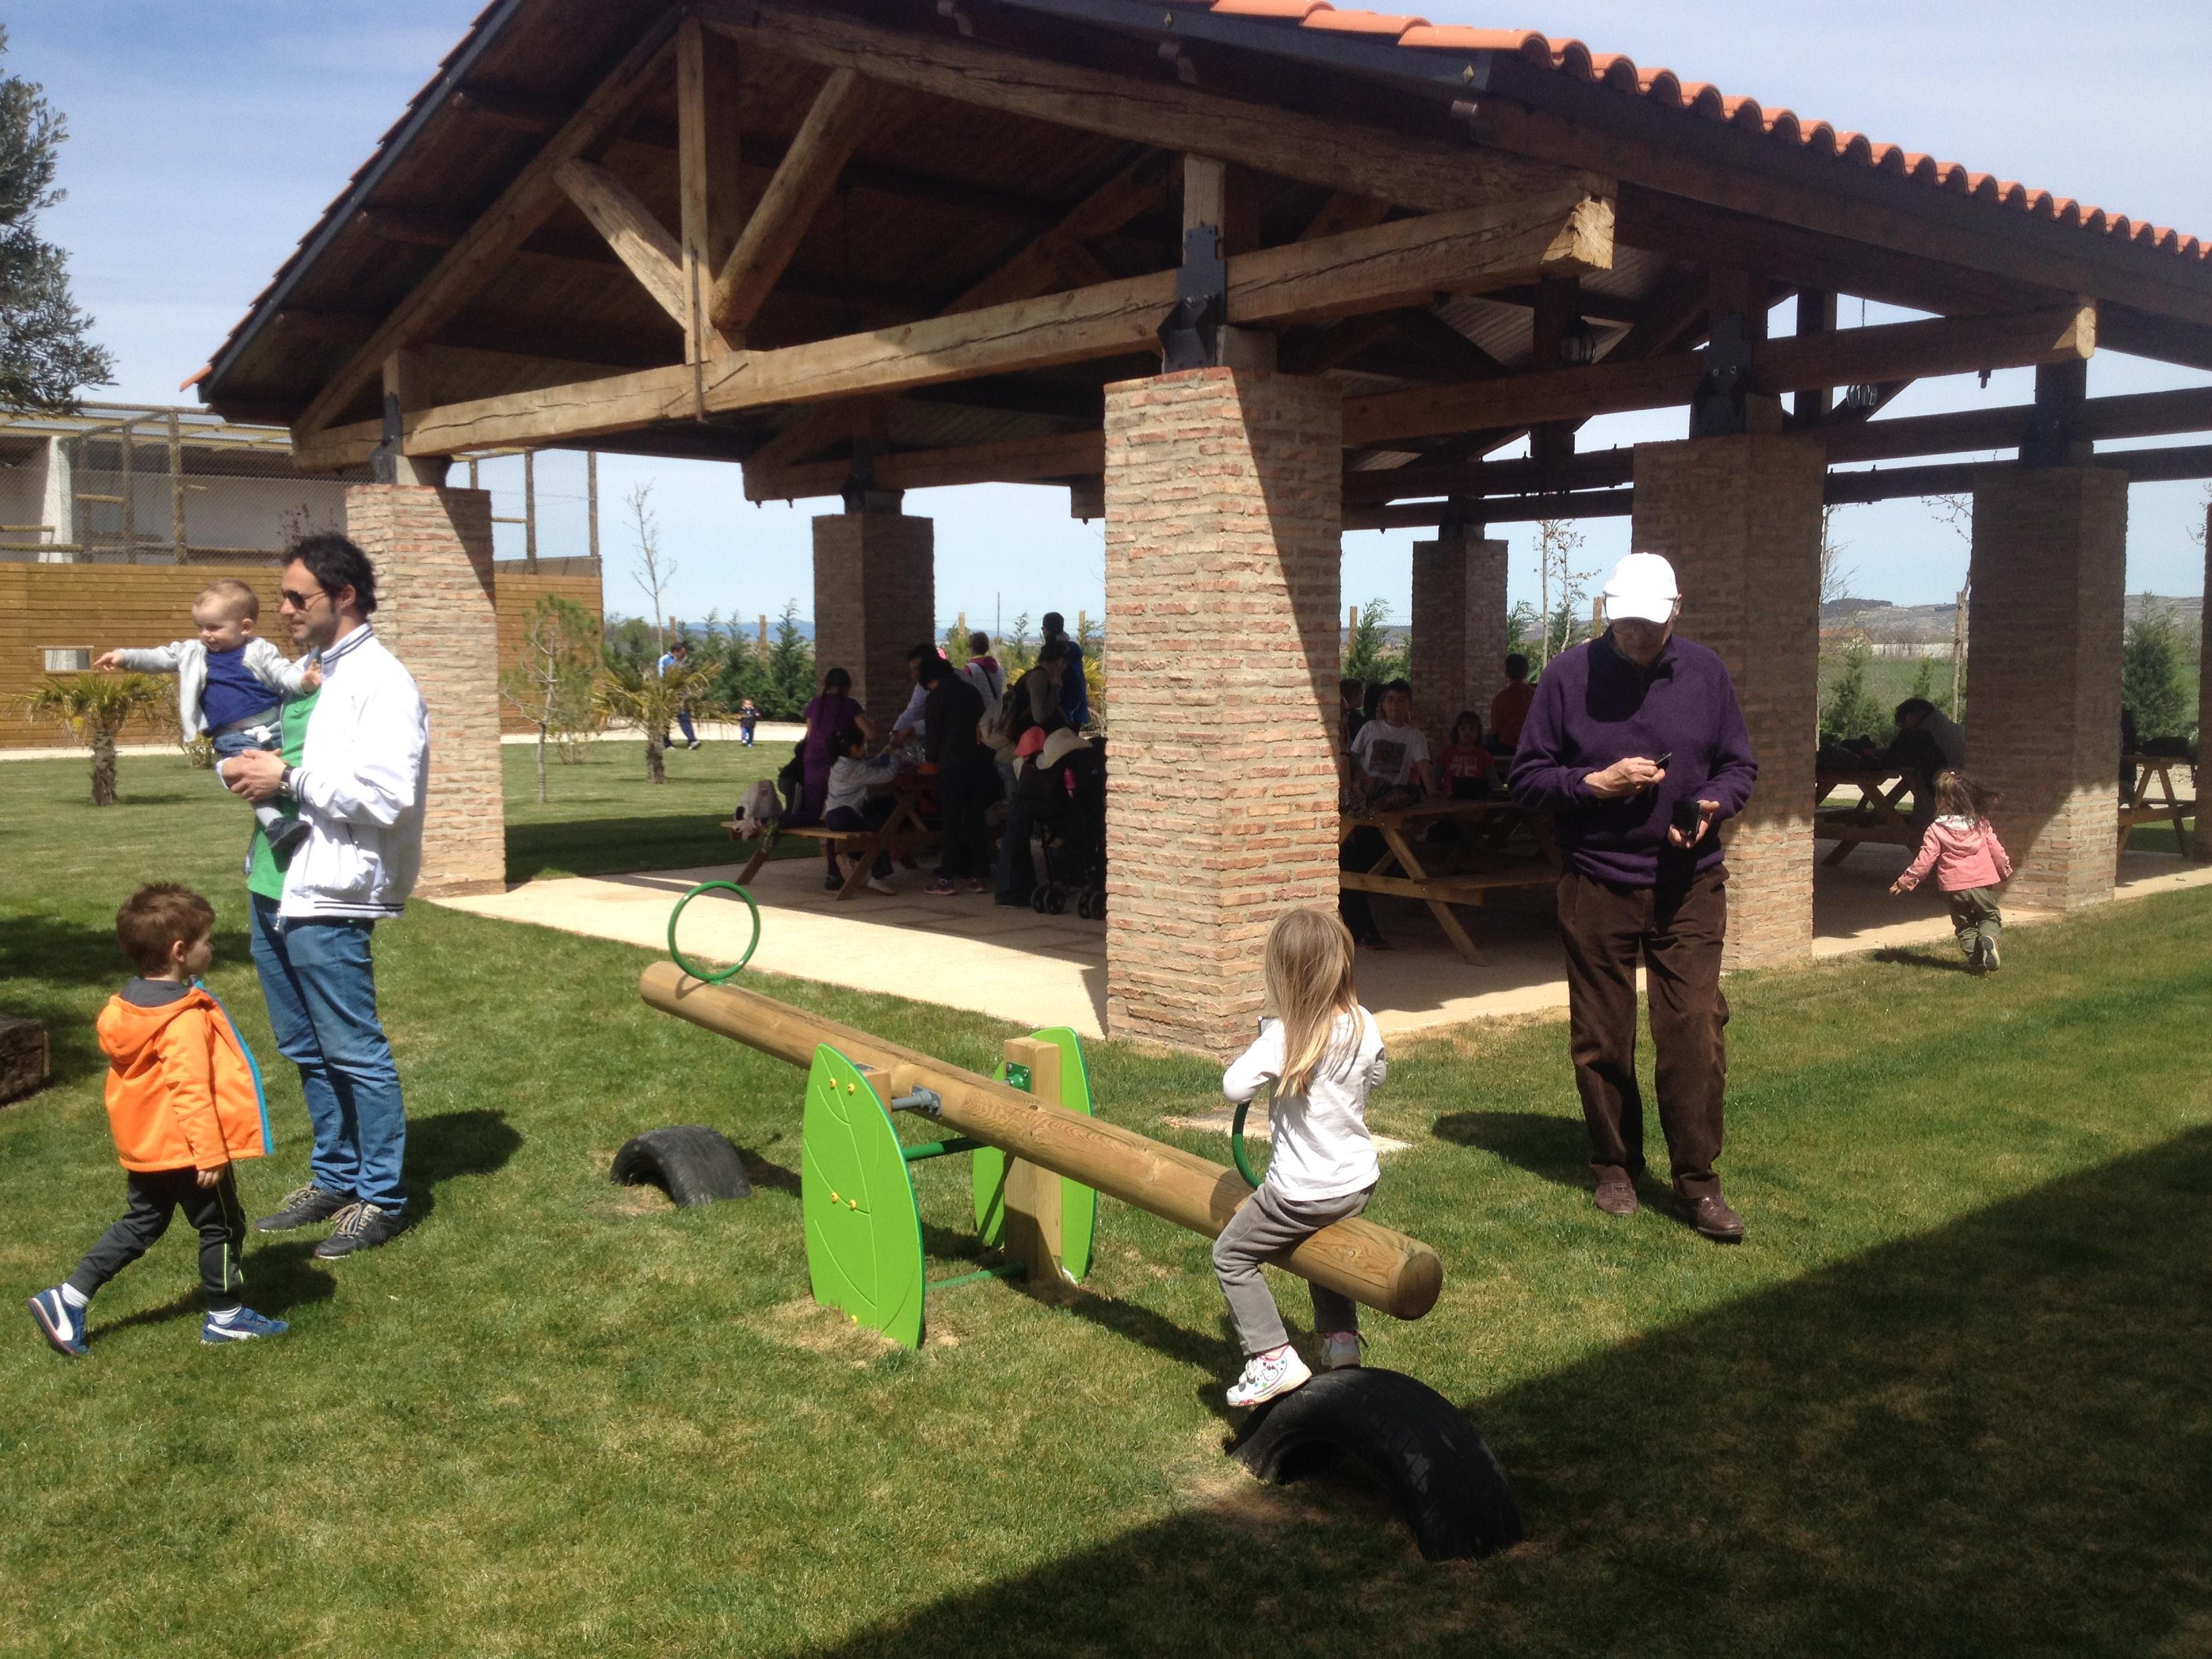 Tierra Rapaz - Lugar de interés - La Rioja Turismo